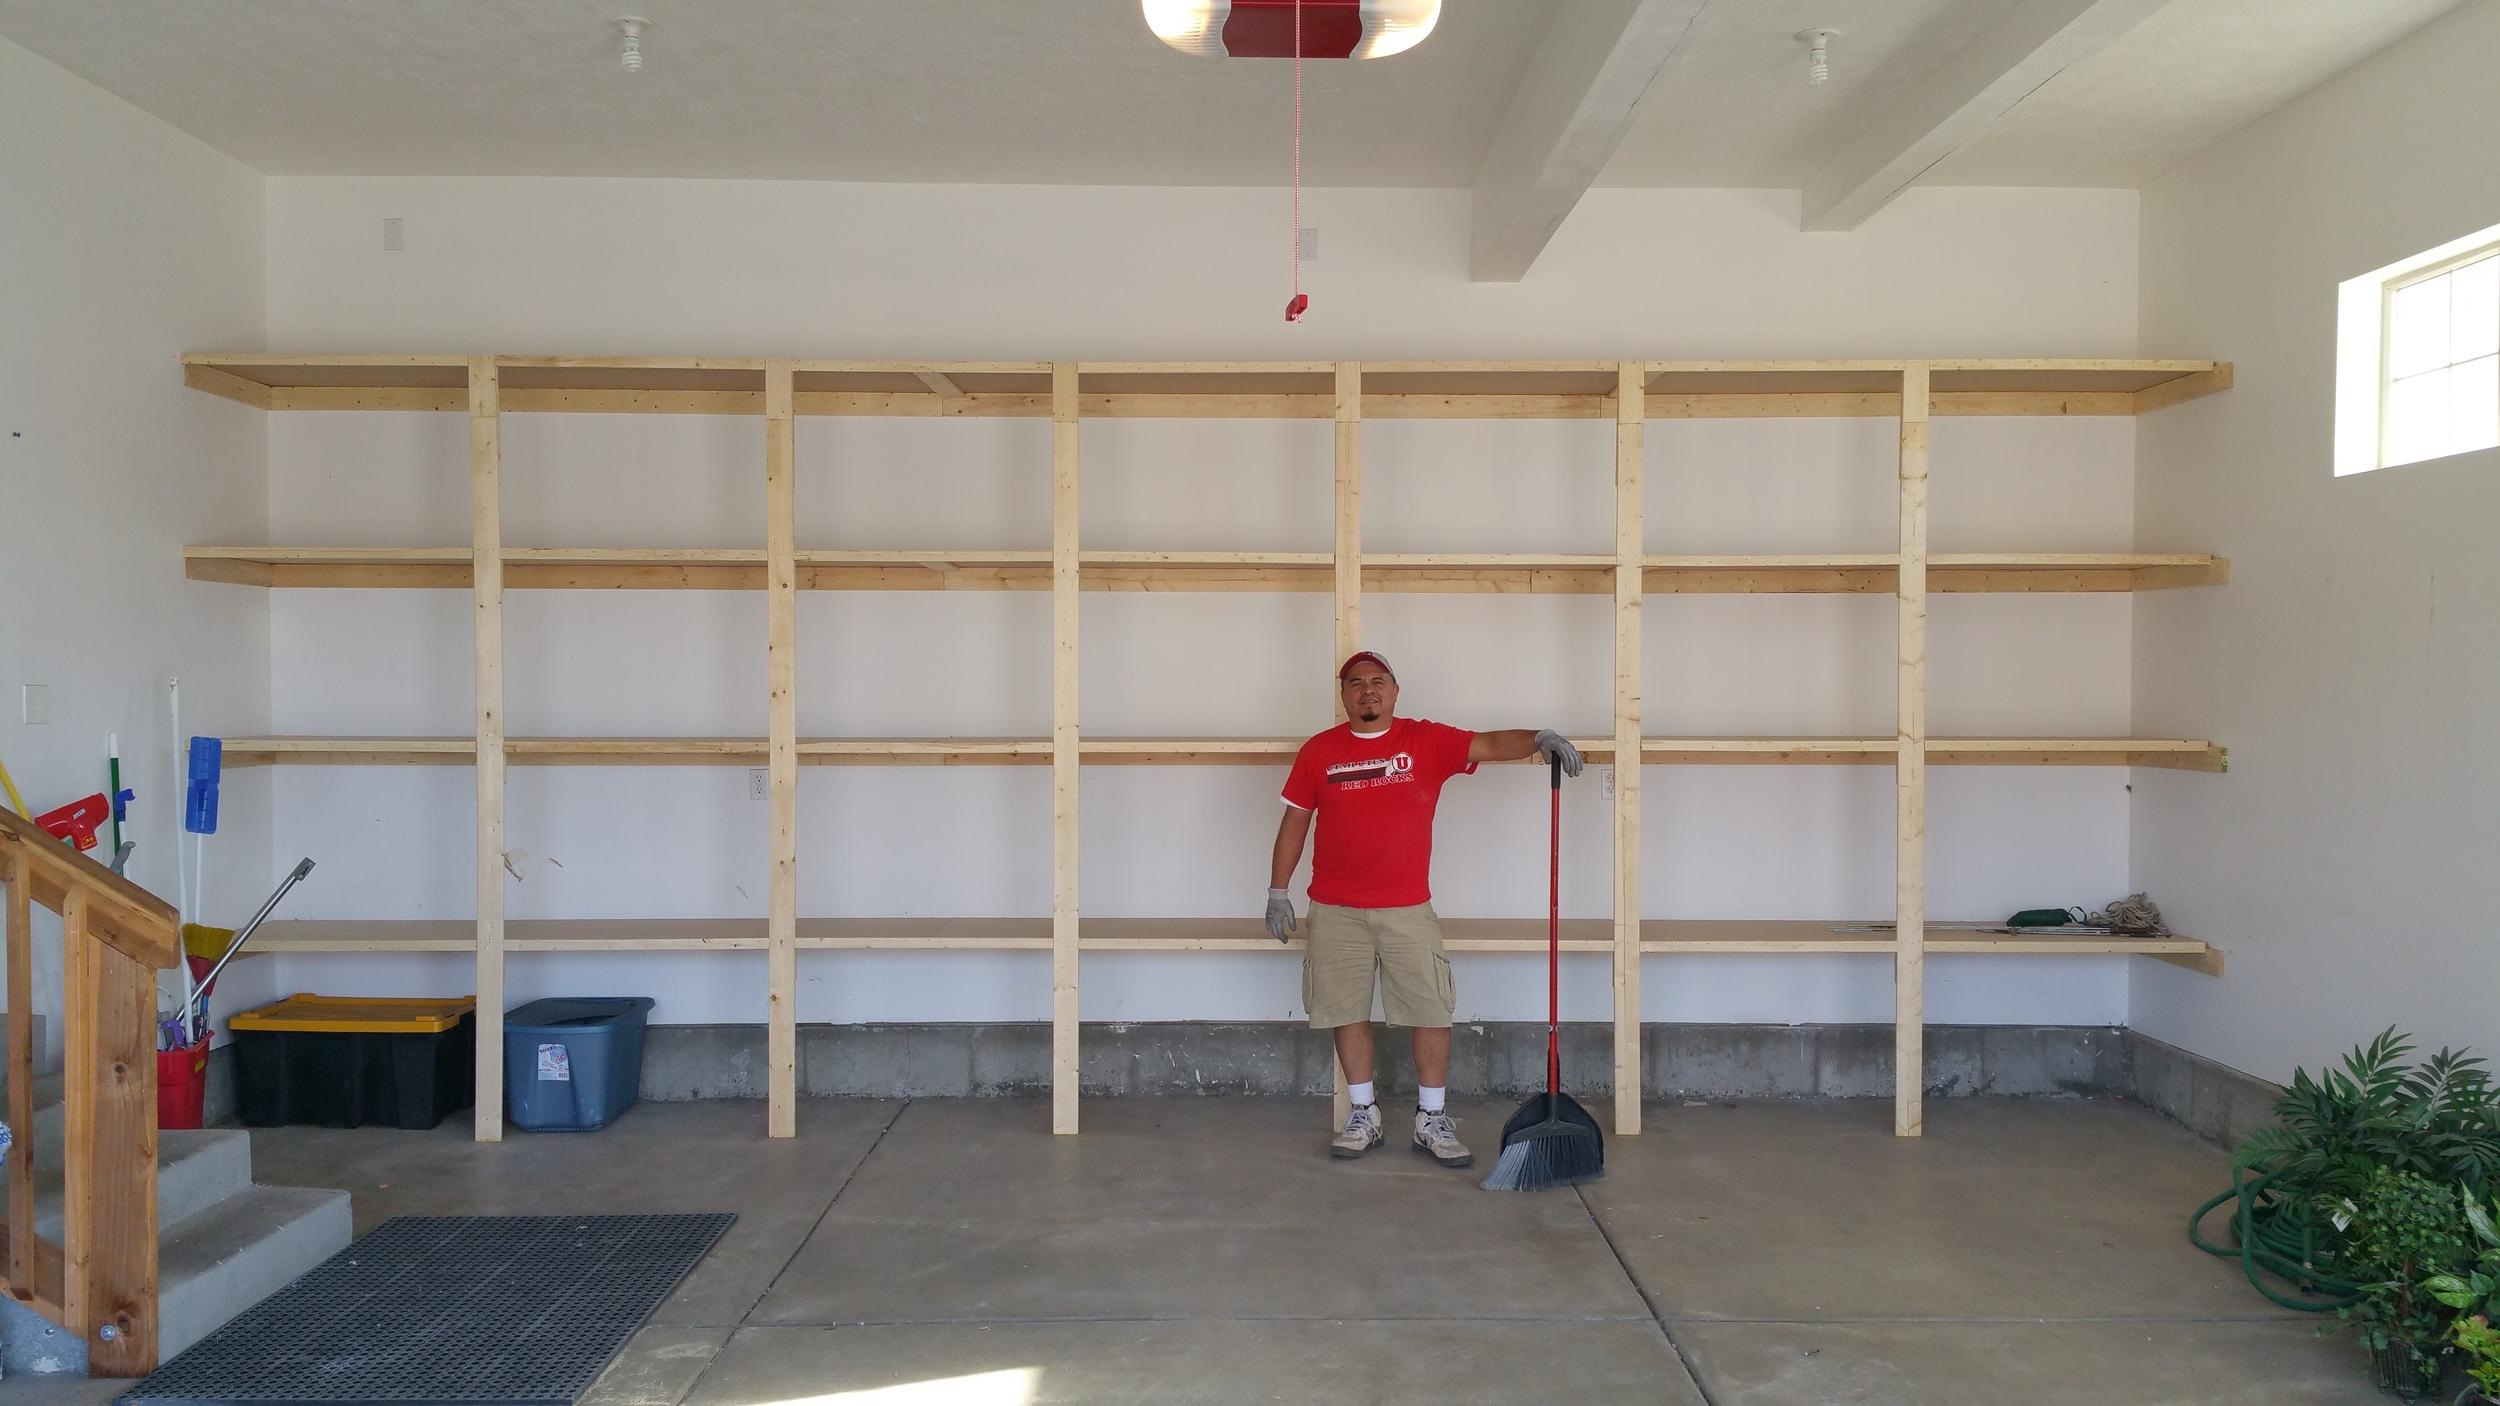 Full Wall Shelving